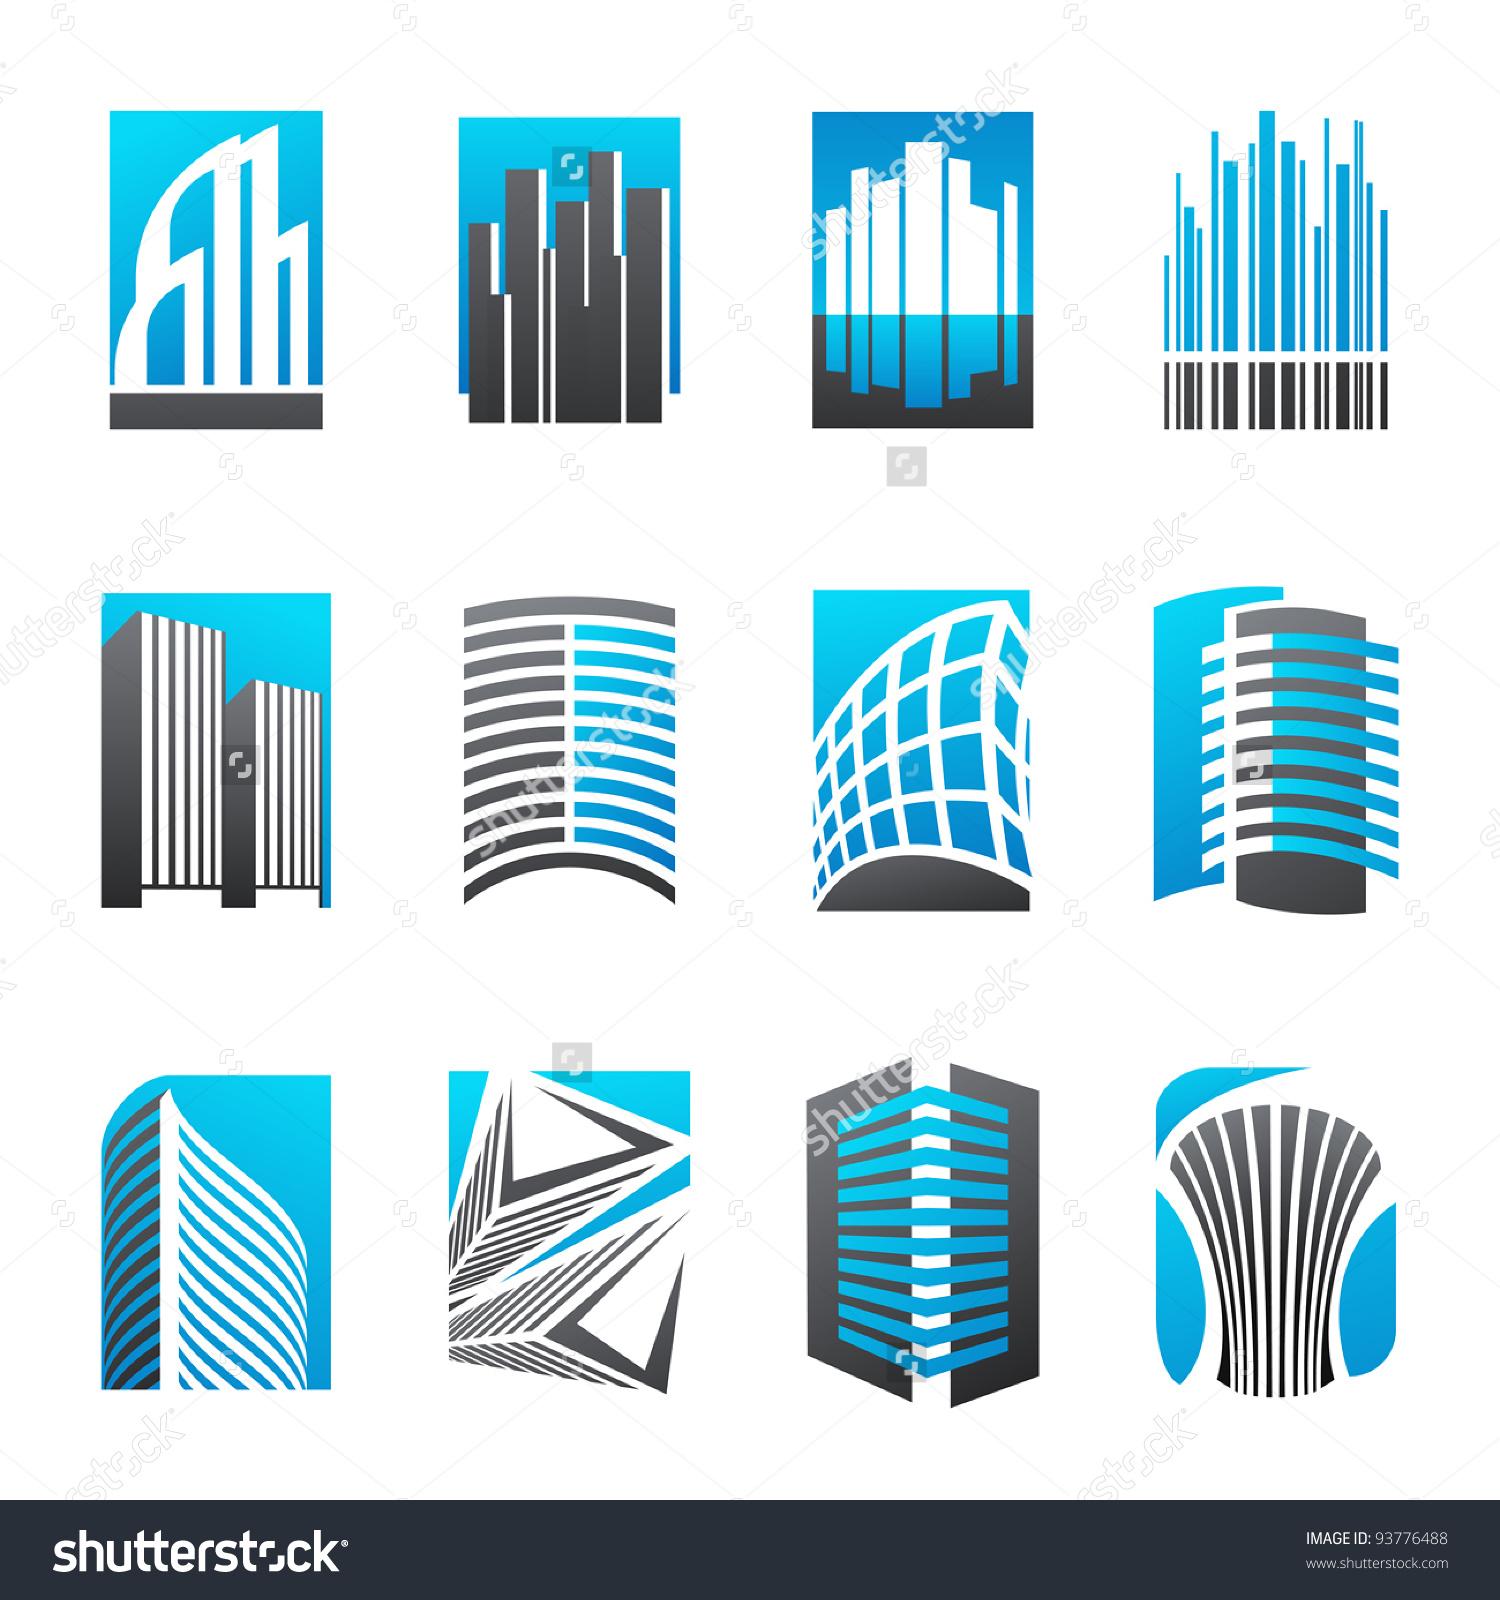 Modern architecture clipart clipground for Interior design video clips